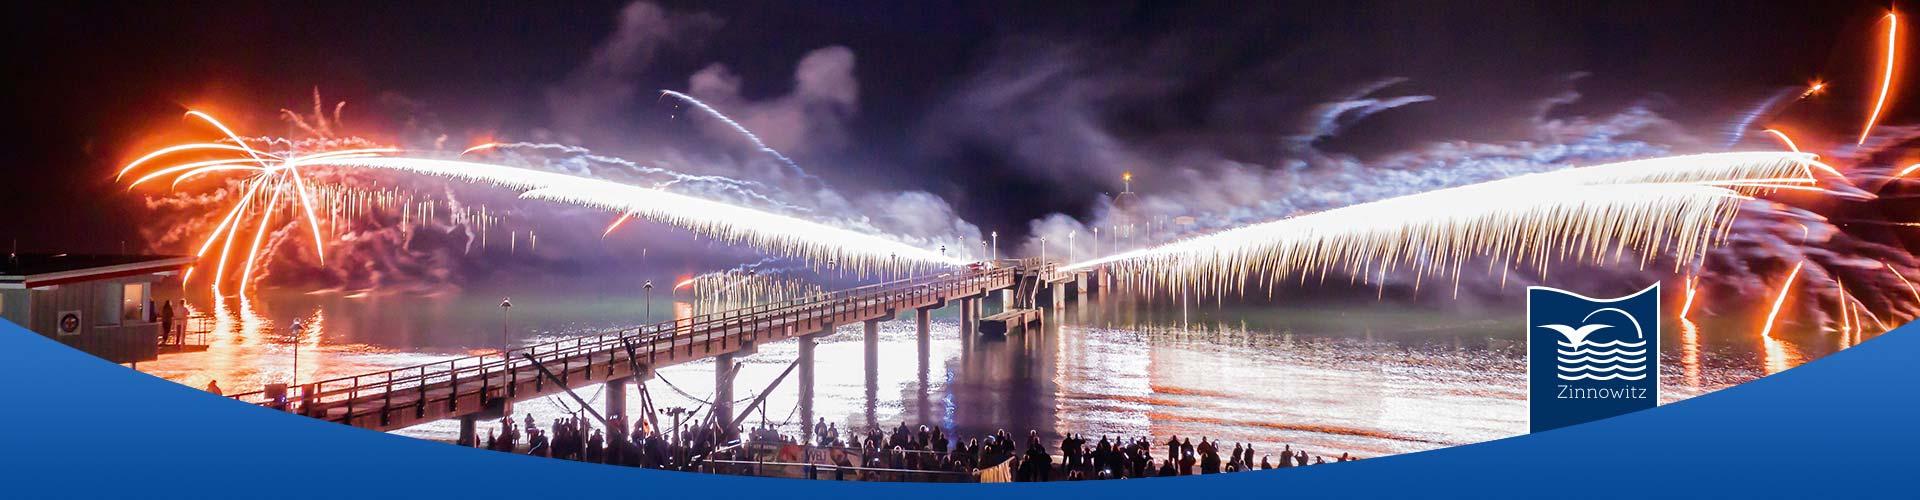 Seebrücke Ostseebad Zinnowitz Feuerwerk